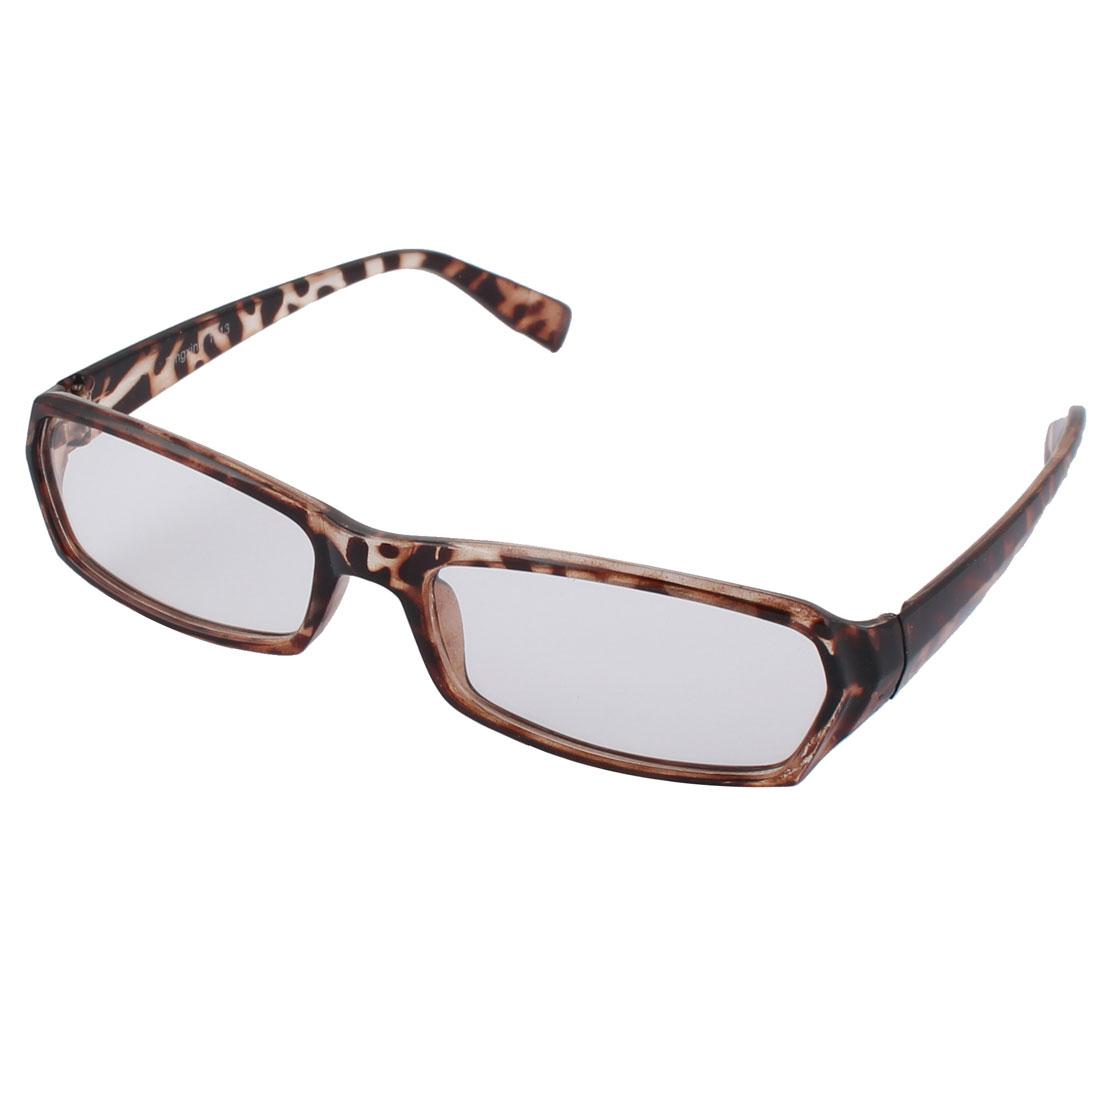 Women Clear Lens Leopard Printed Frame Full Rim Plastic Eyewear Plain Glass